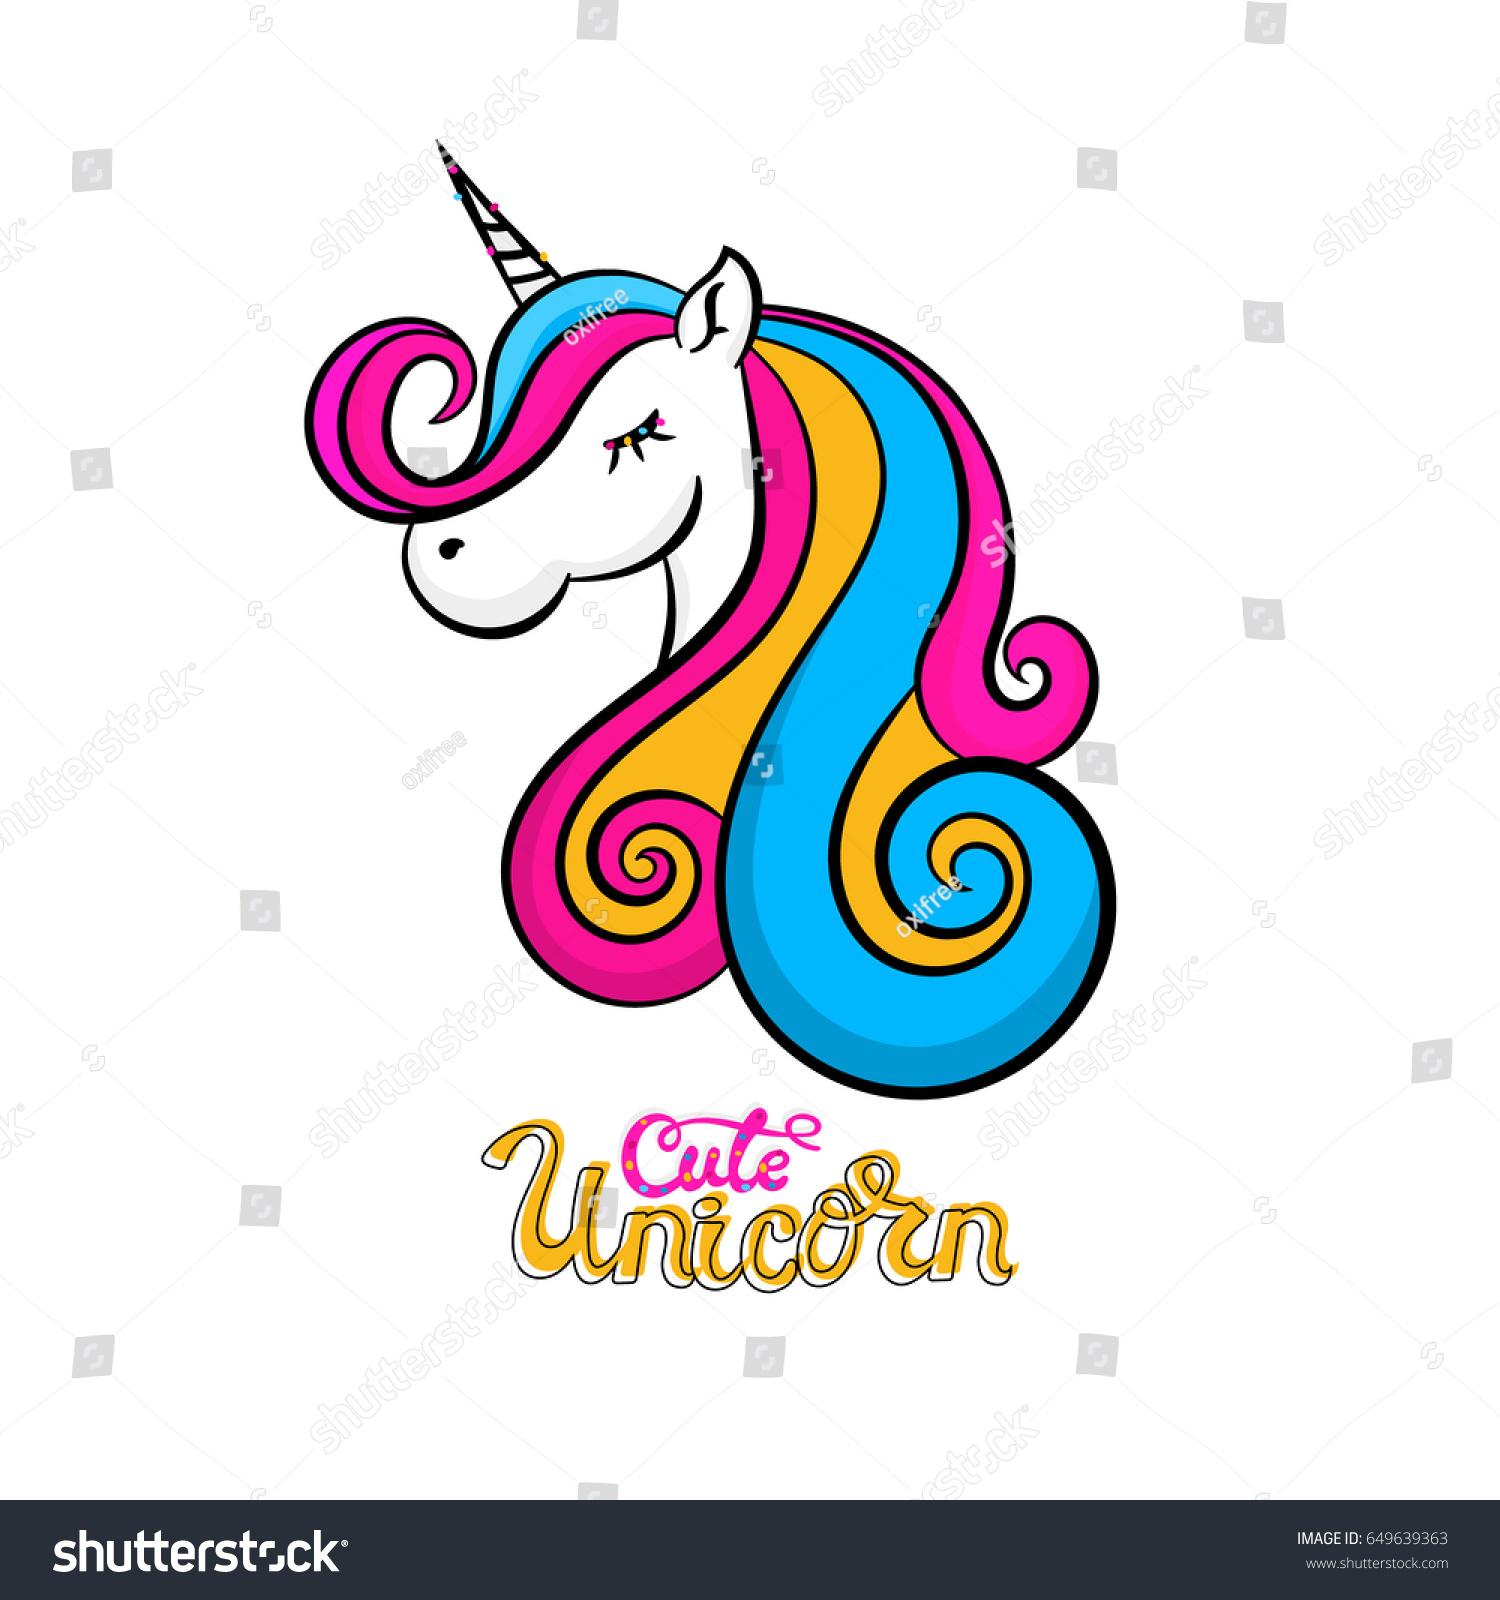 Vector Cute Unicorn Icon Isolated Cartoon Stock Vector ...